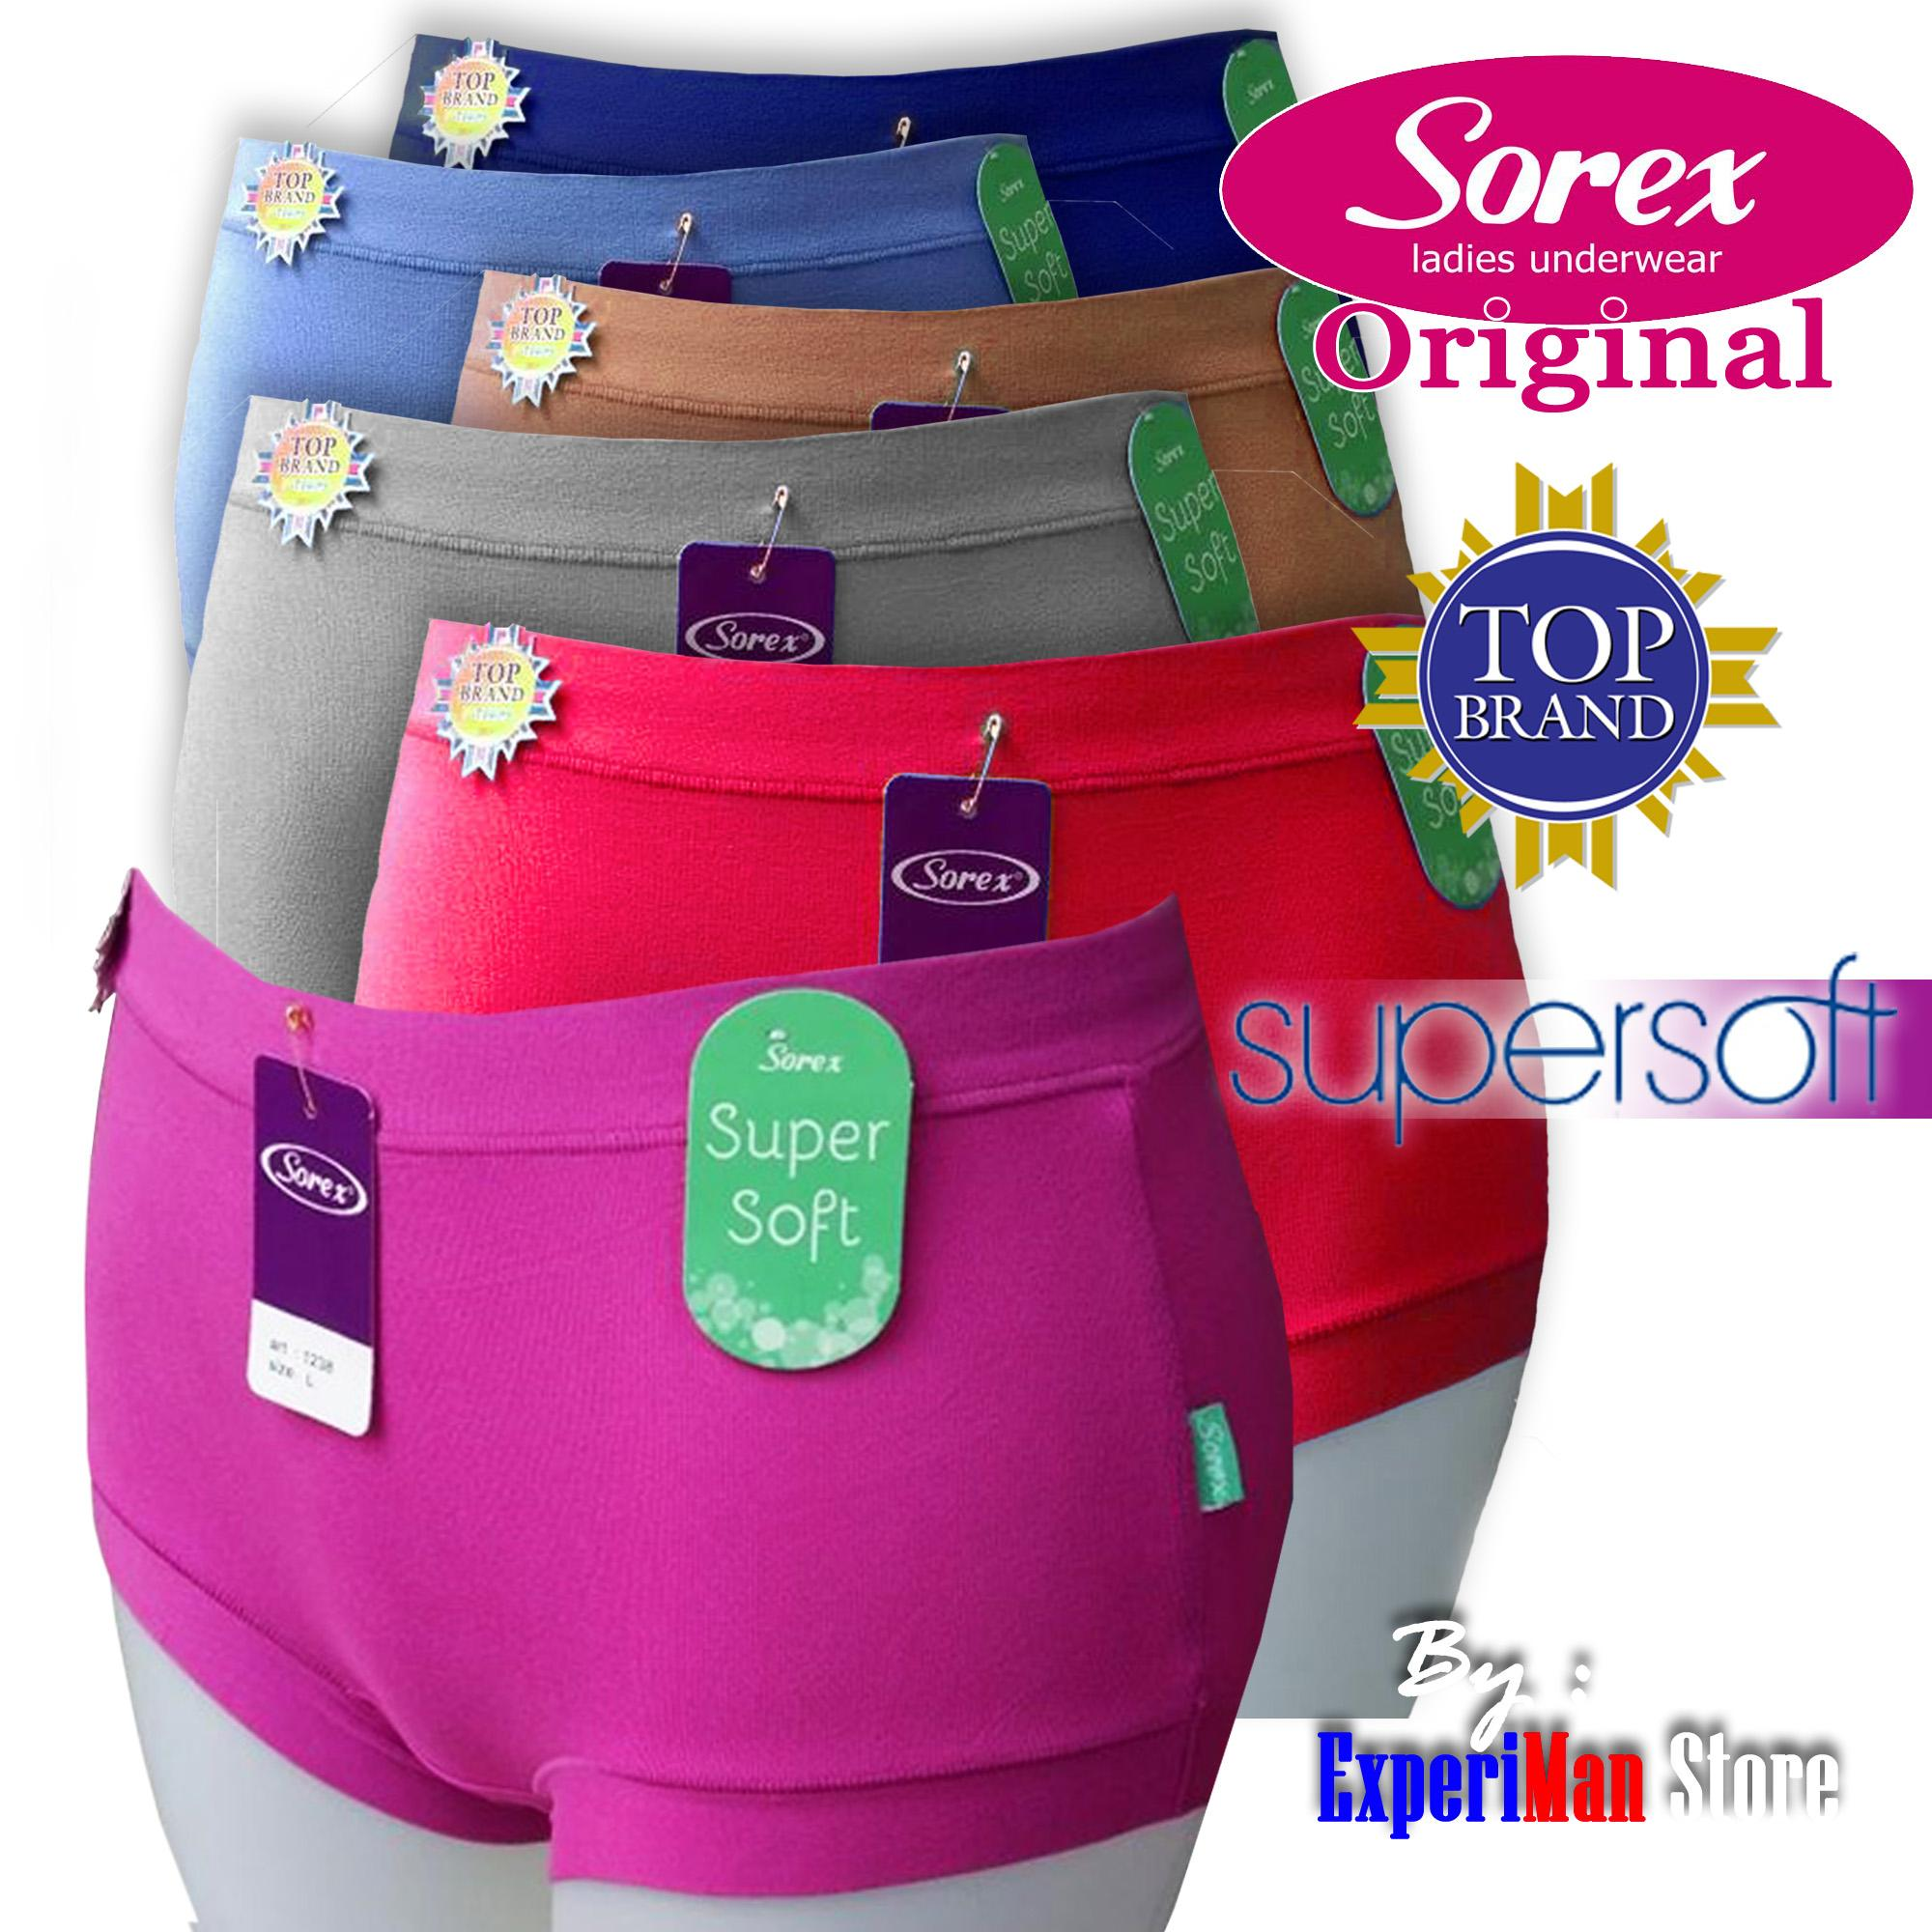 3Pcs Sorex Original Celana Dalam Wanita Super Lembut Harga Grosir 223347f6d7